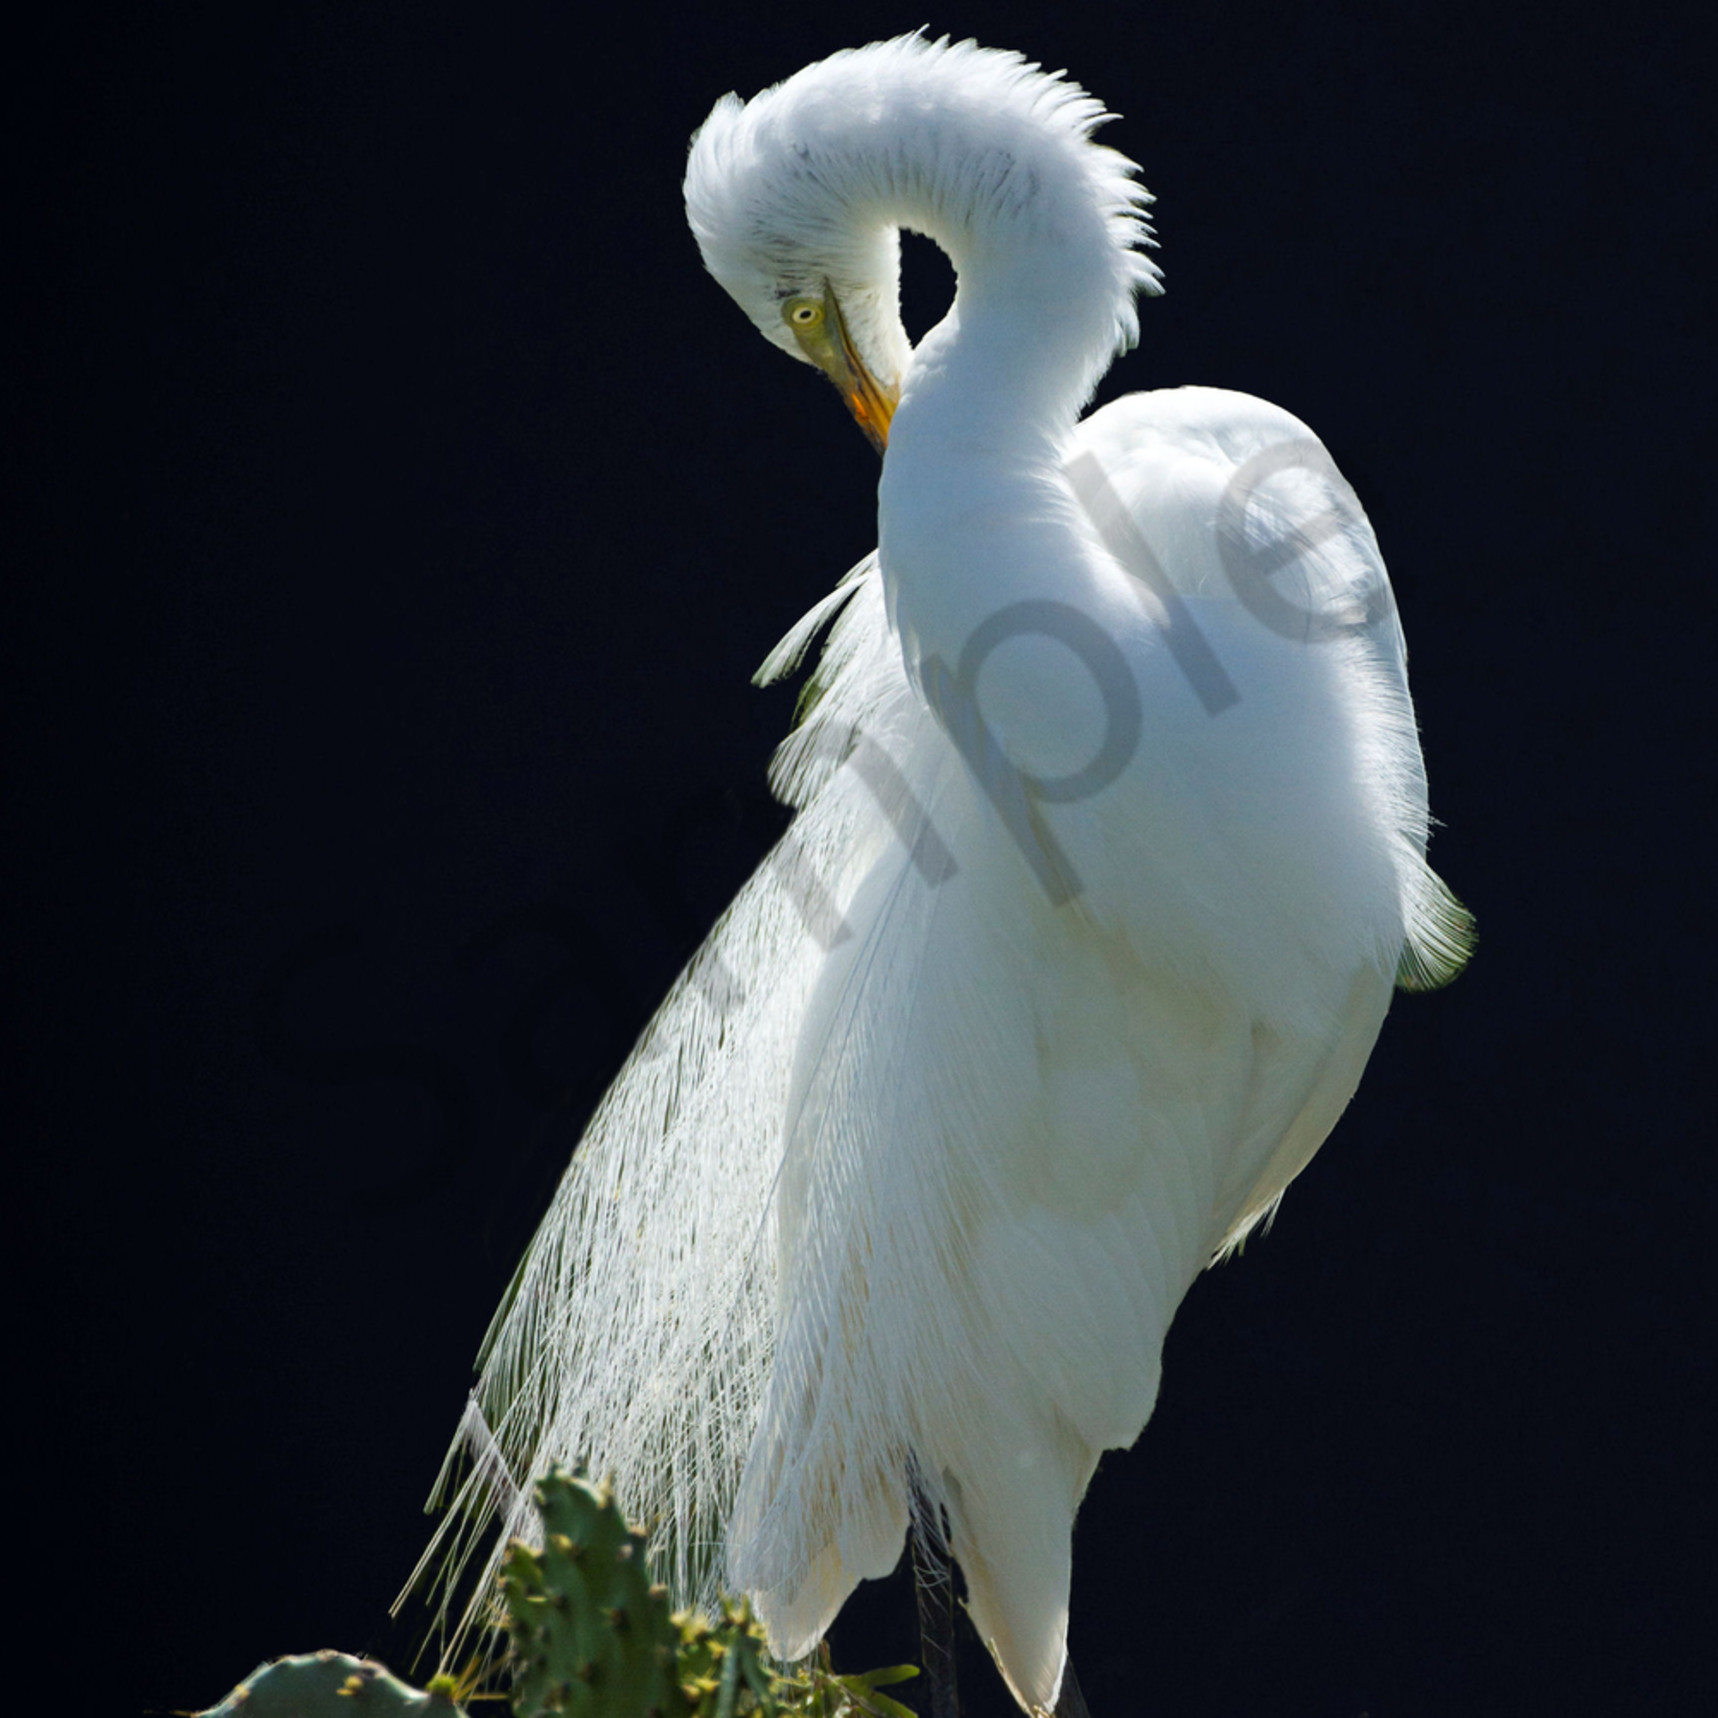 Moonlit egret 31x47 dlj0jg